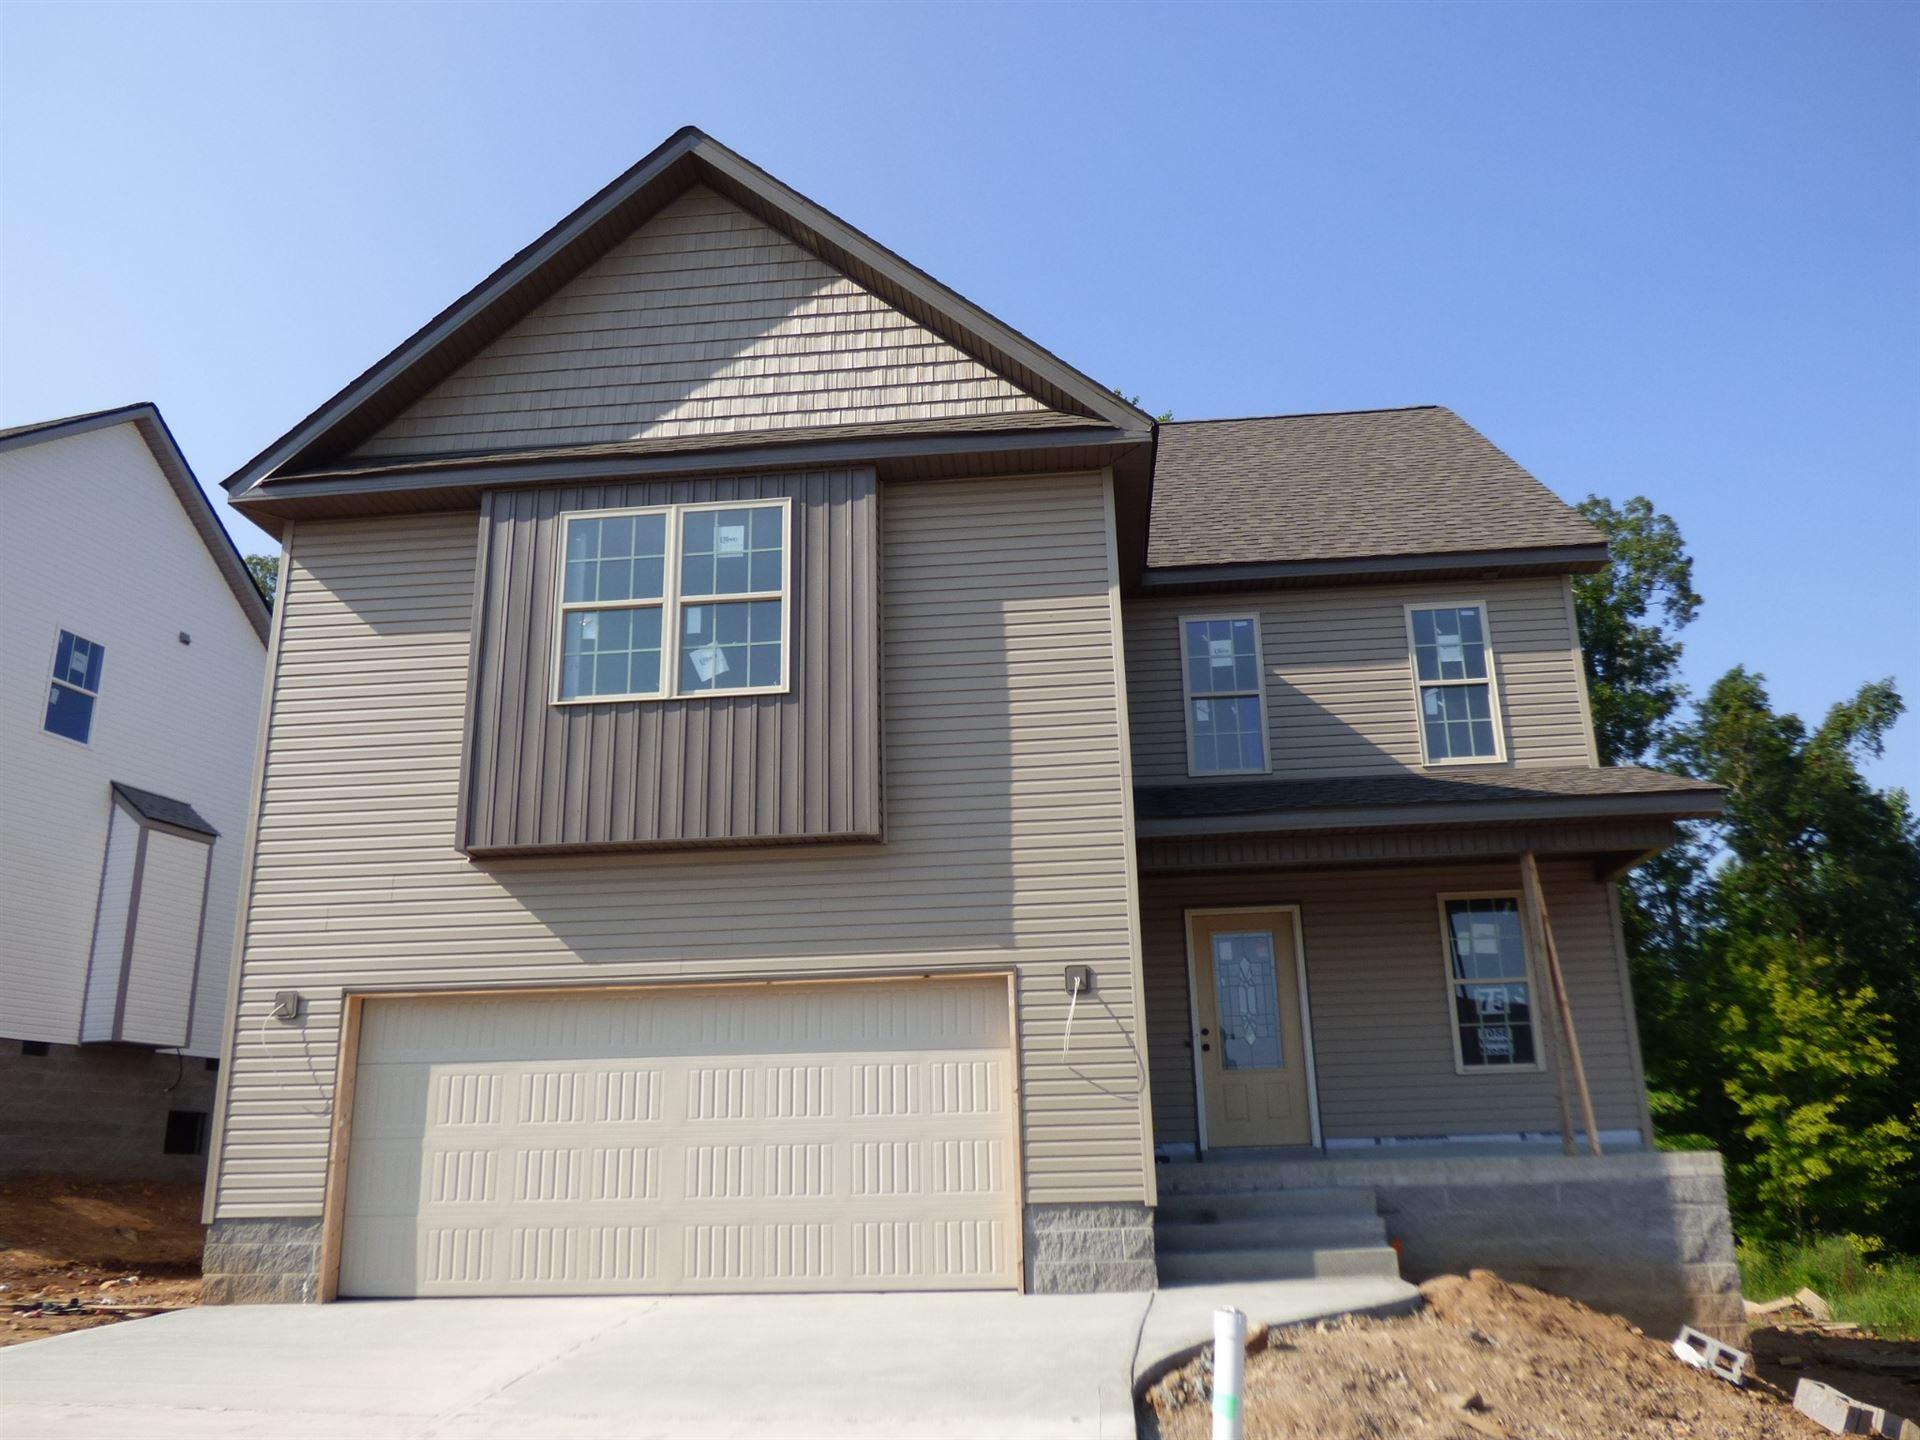 1058 Winesap Rd, Clarksville, TN 37040 - MLS#: 2279075